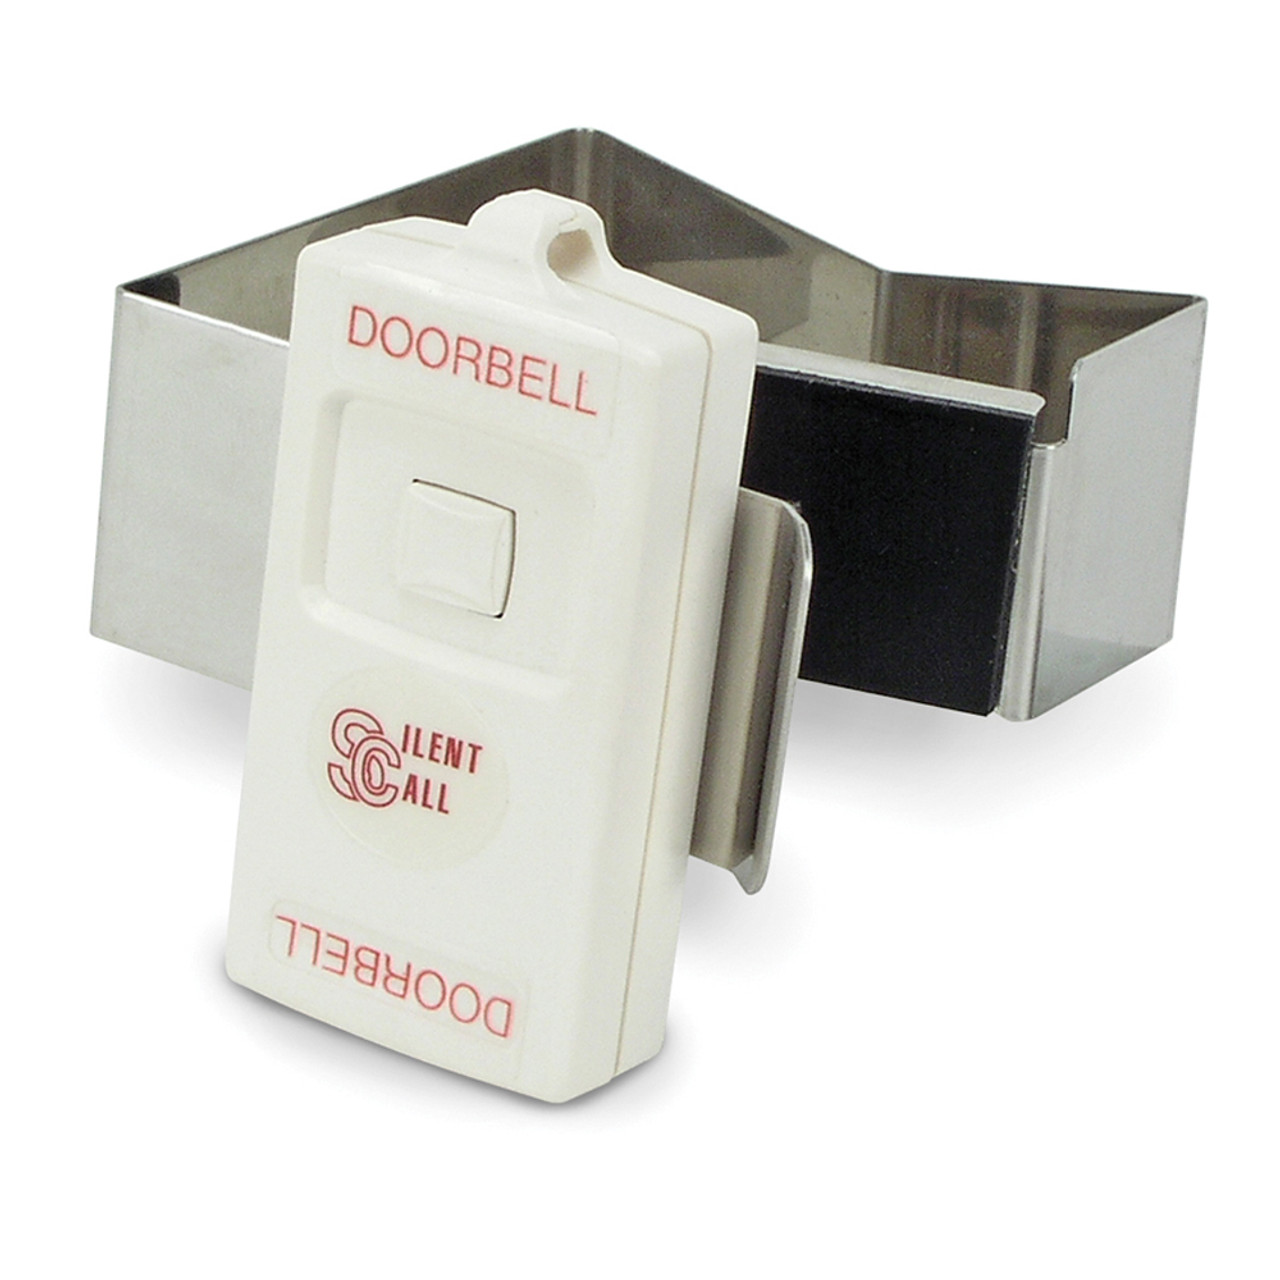 Silent Call Clip On Doorbell Transmitter